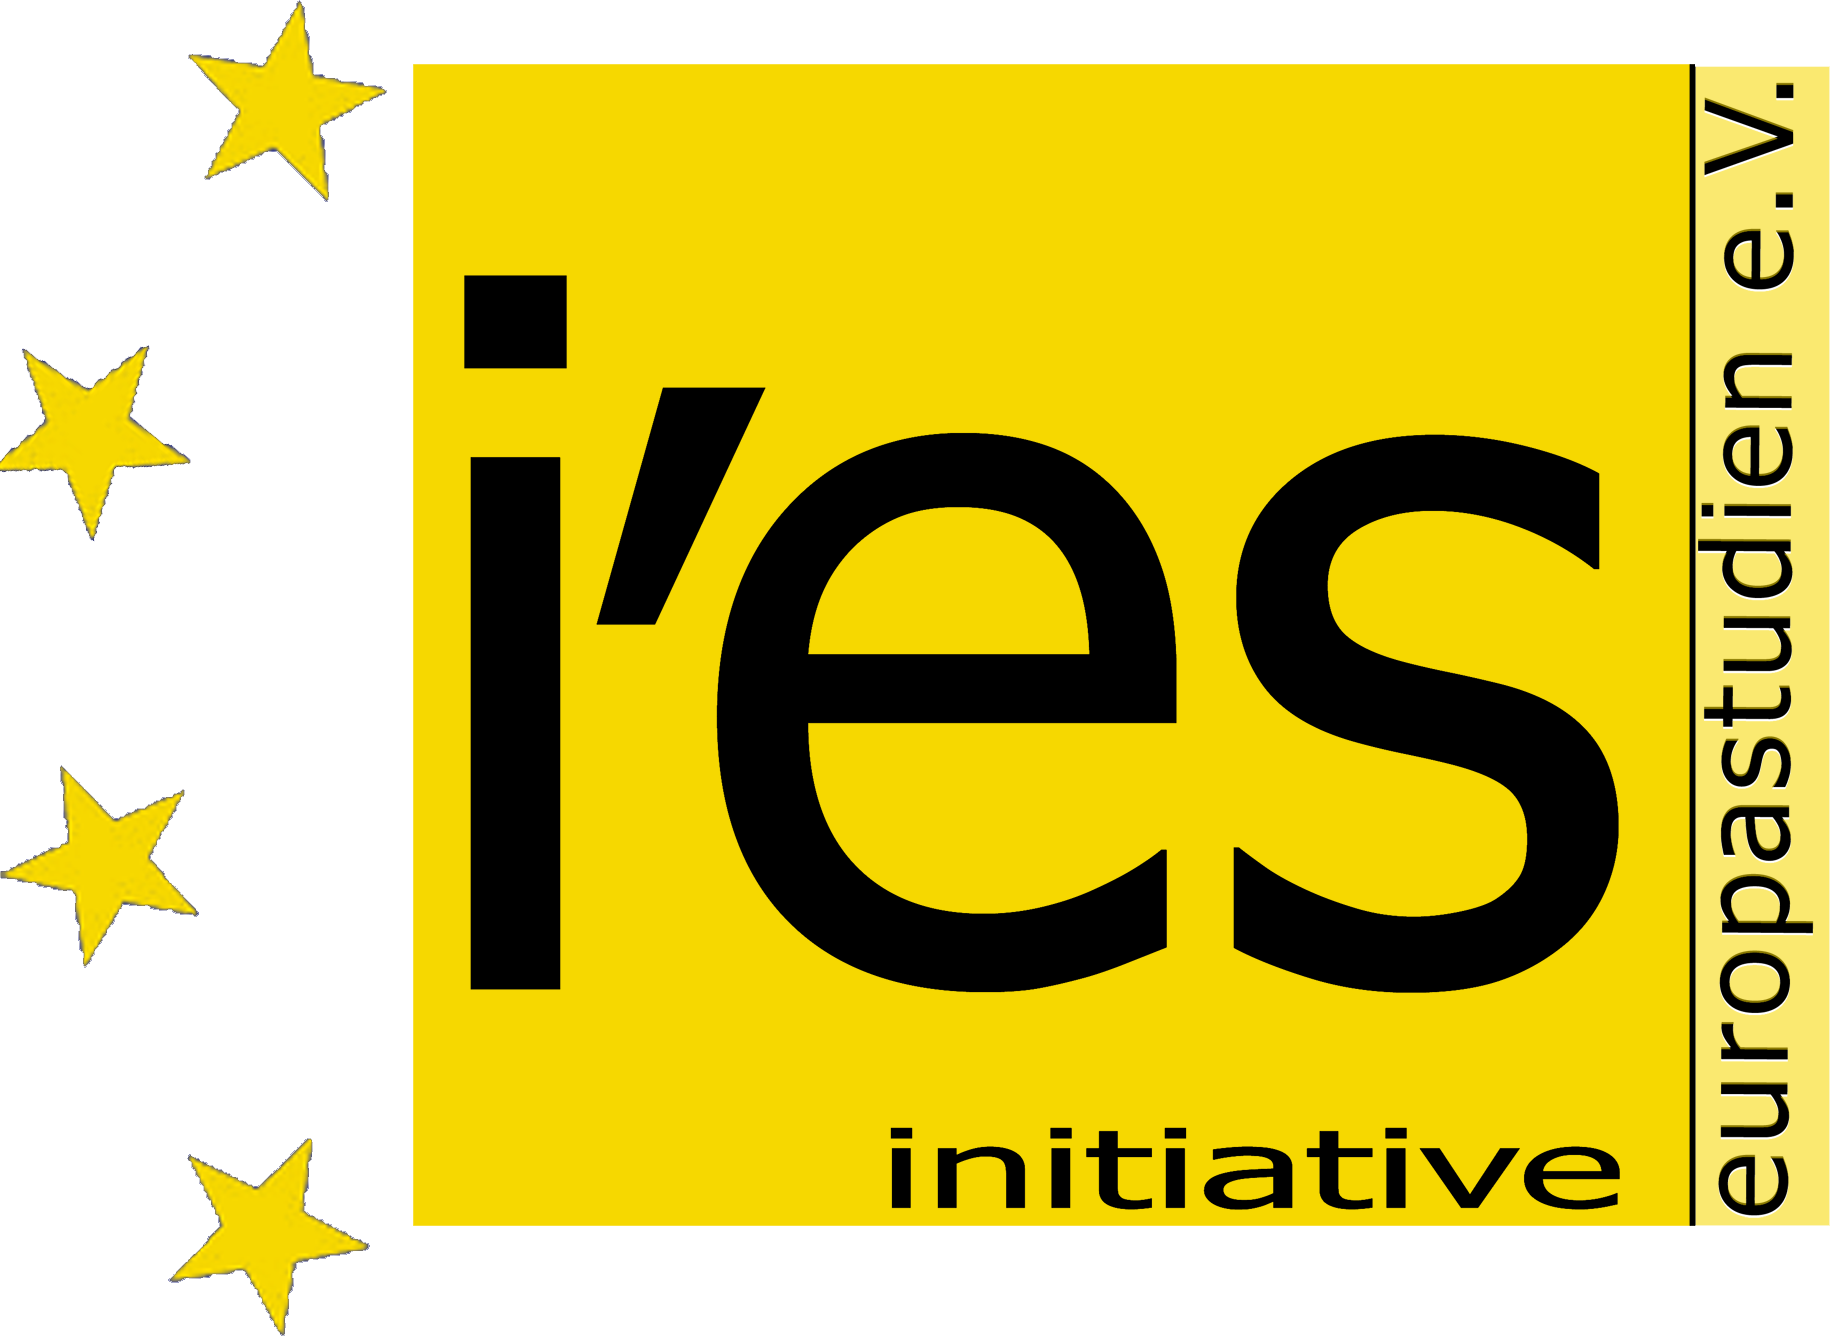 Initiative Europa-Studien e.V.